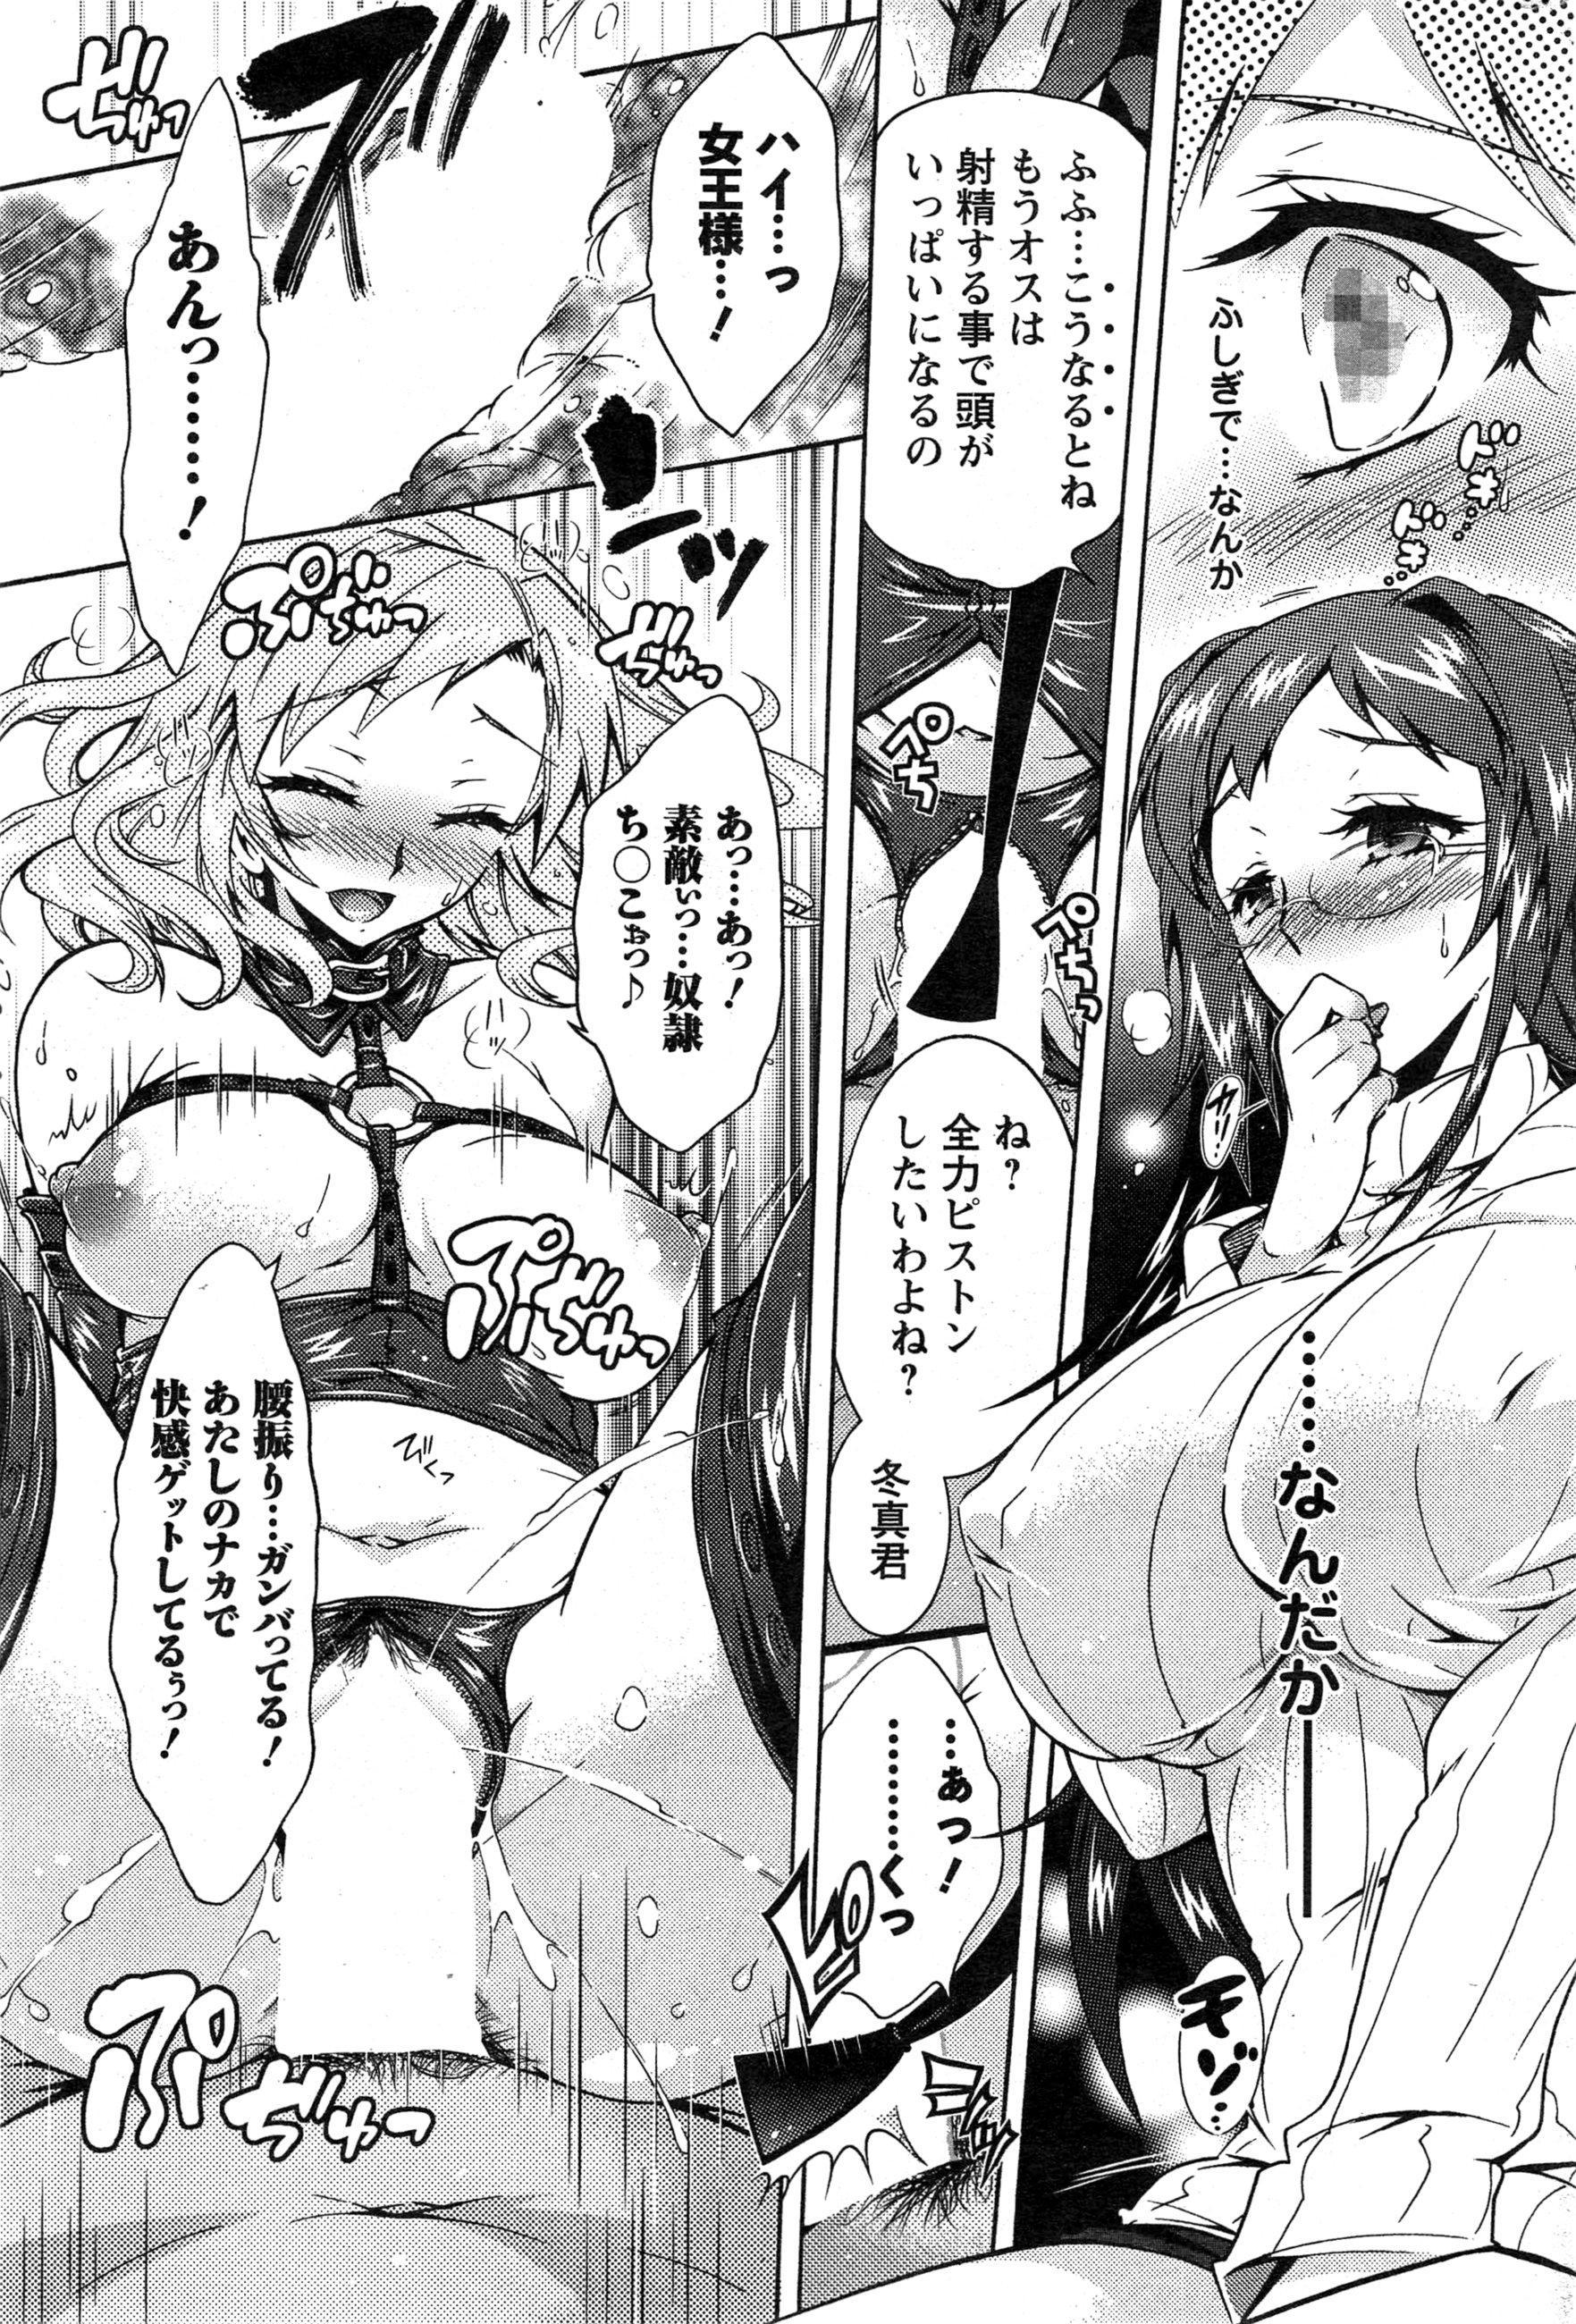 [Honda Arima] Sanshimai no Omocha - The Slave of Three Sisters Ch. 1-6 71